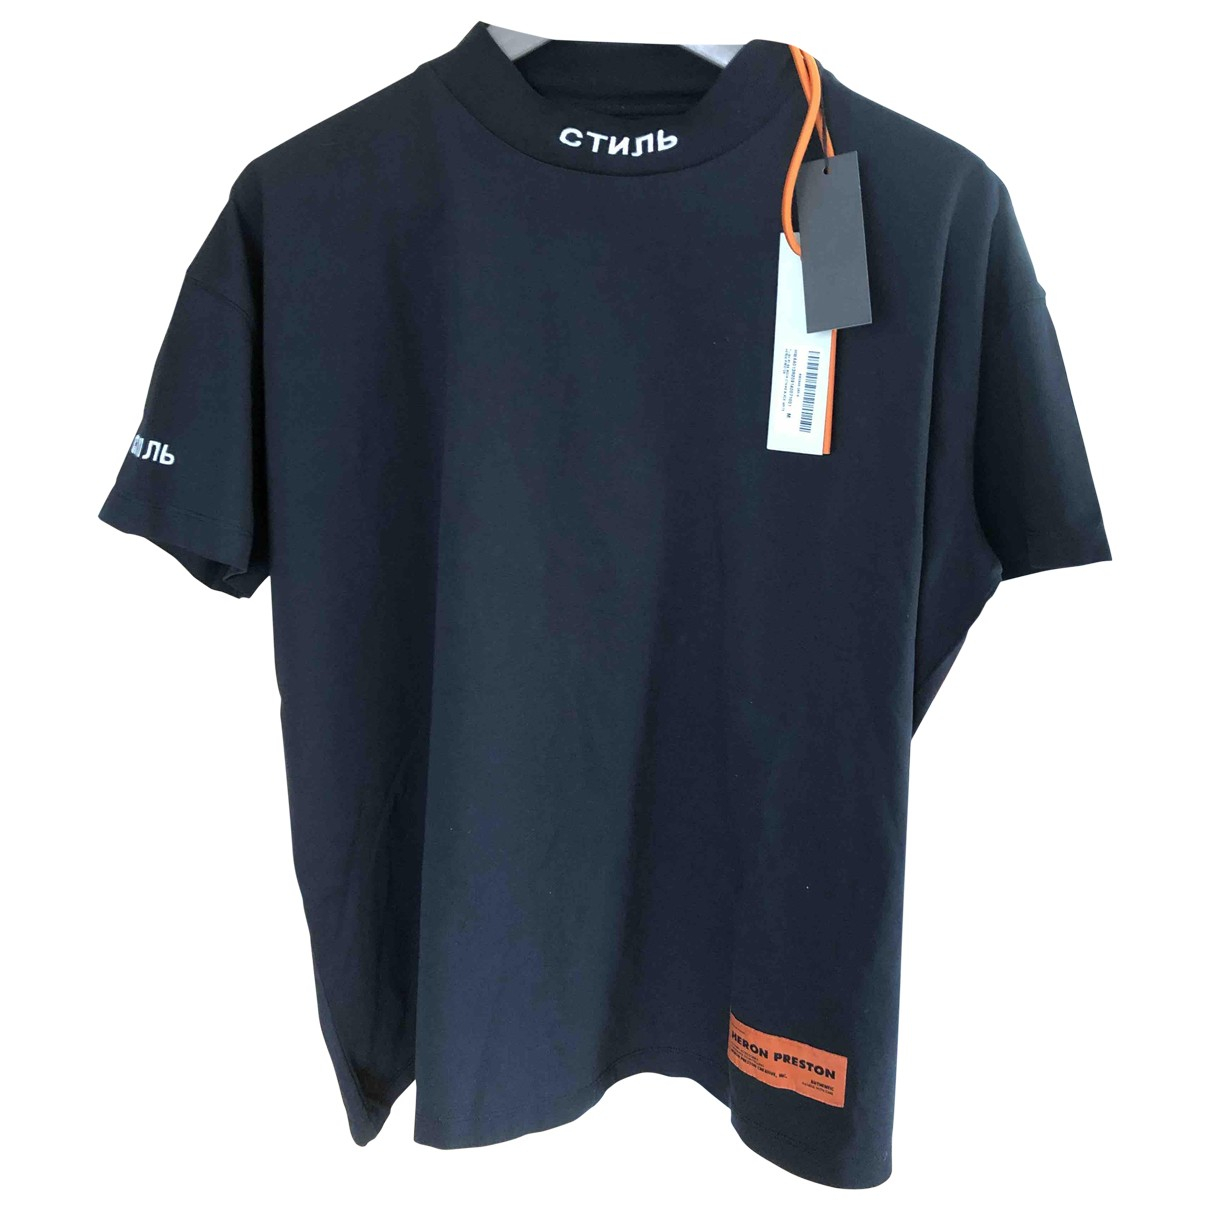 Heron Preston - Tee shirts   pour homme en coton - noir